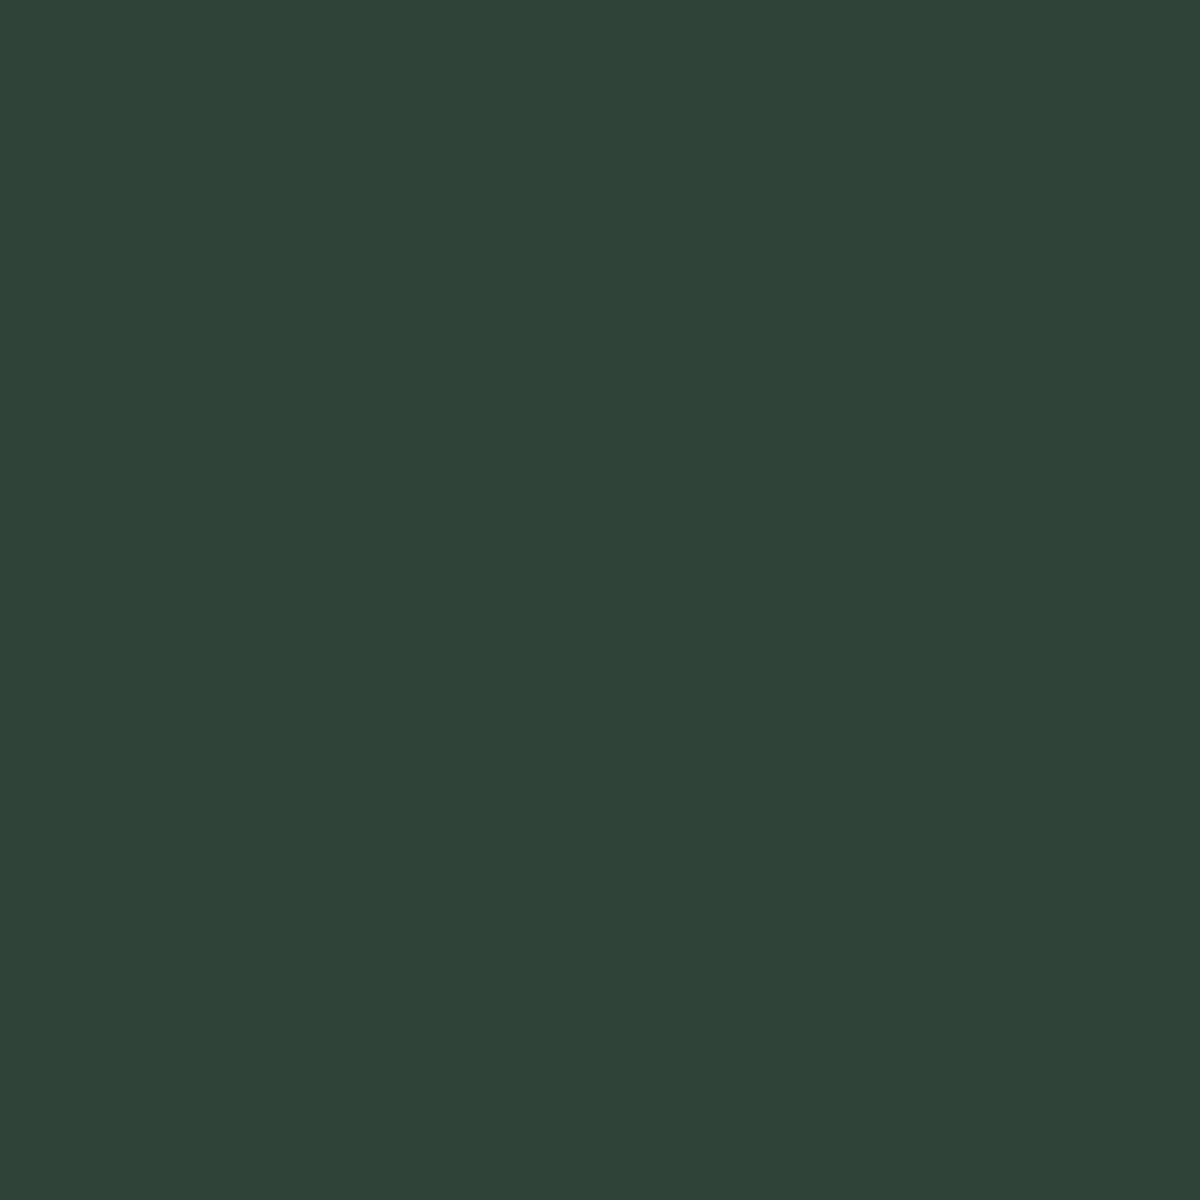 verde-muschio-per-arredare-casa-26